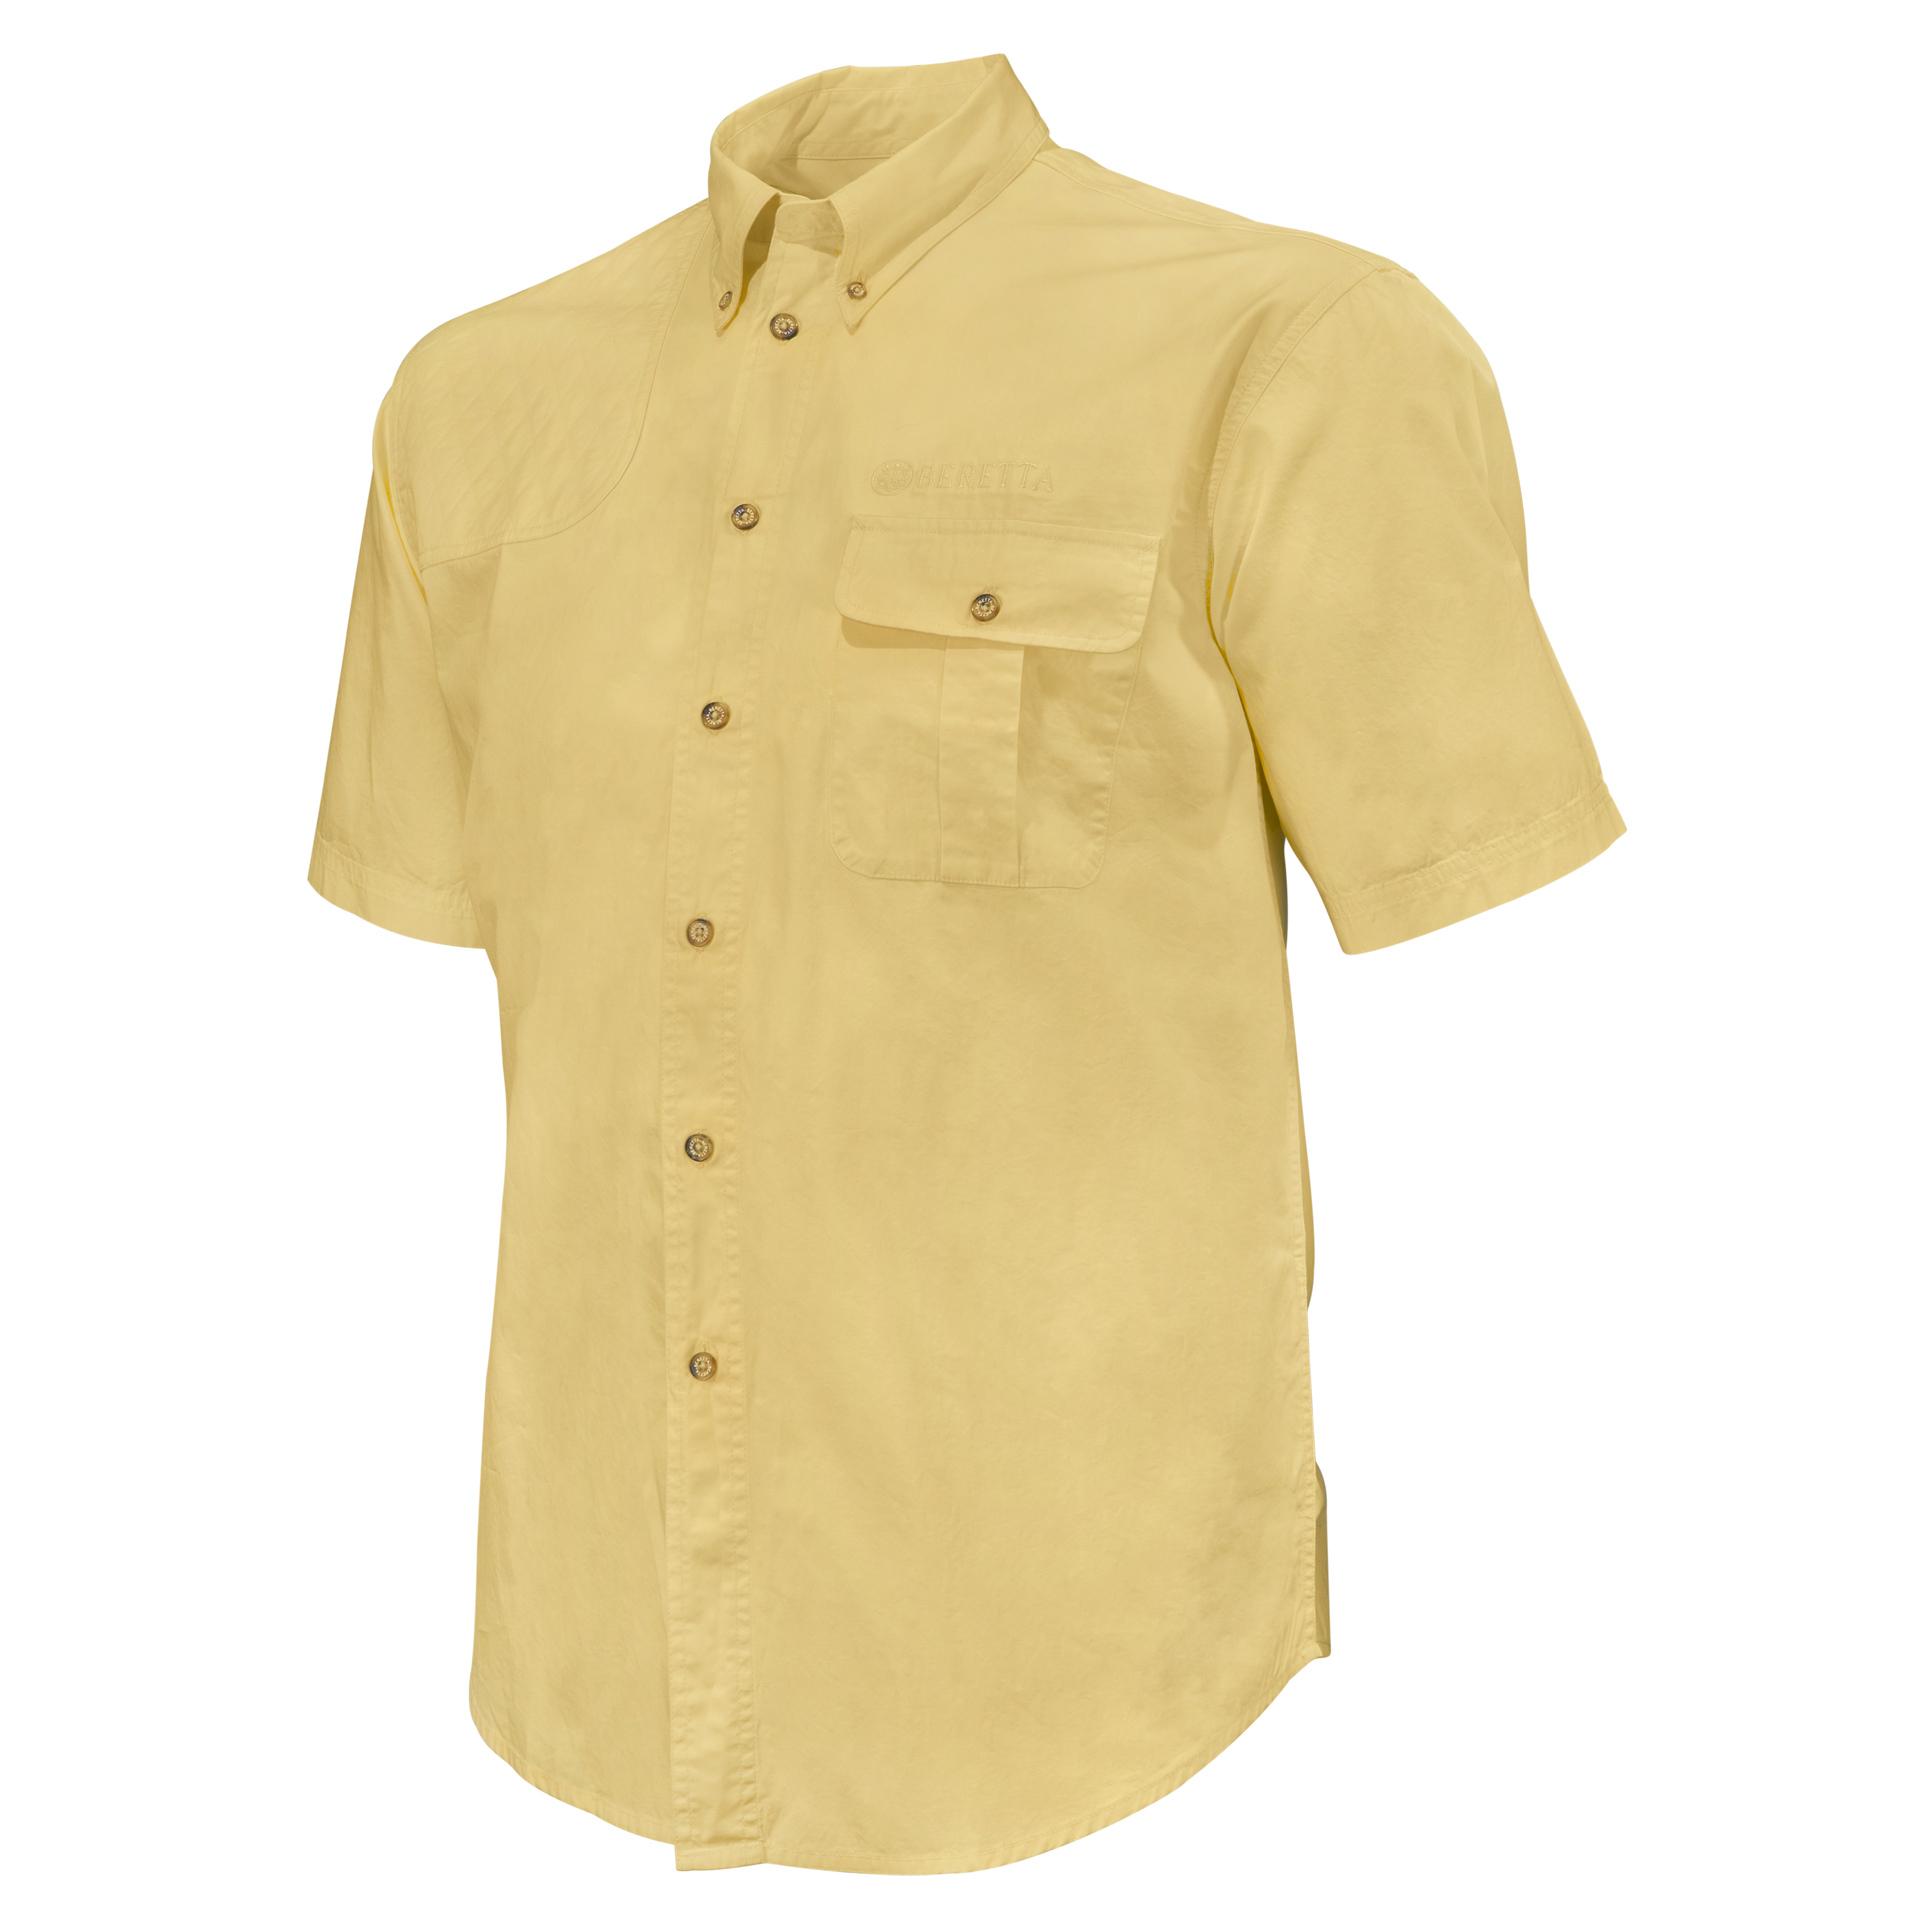 BERETTA TM Short Sleeve Shooting Shirt